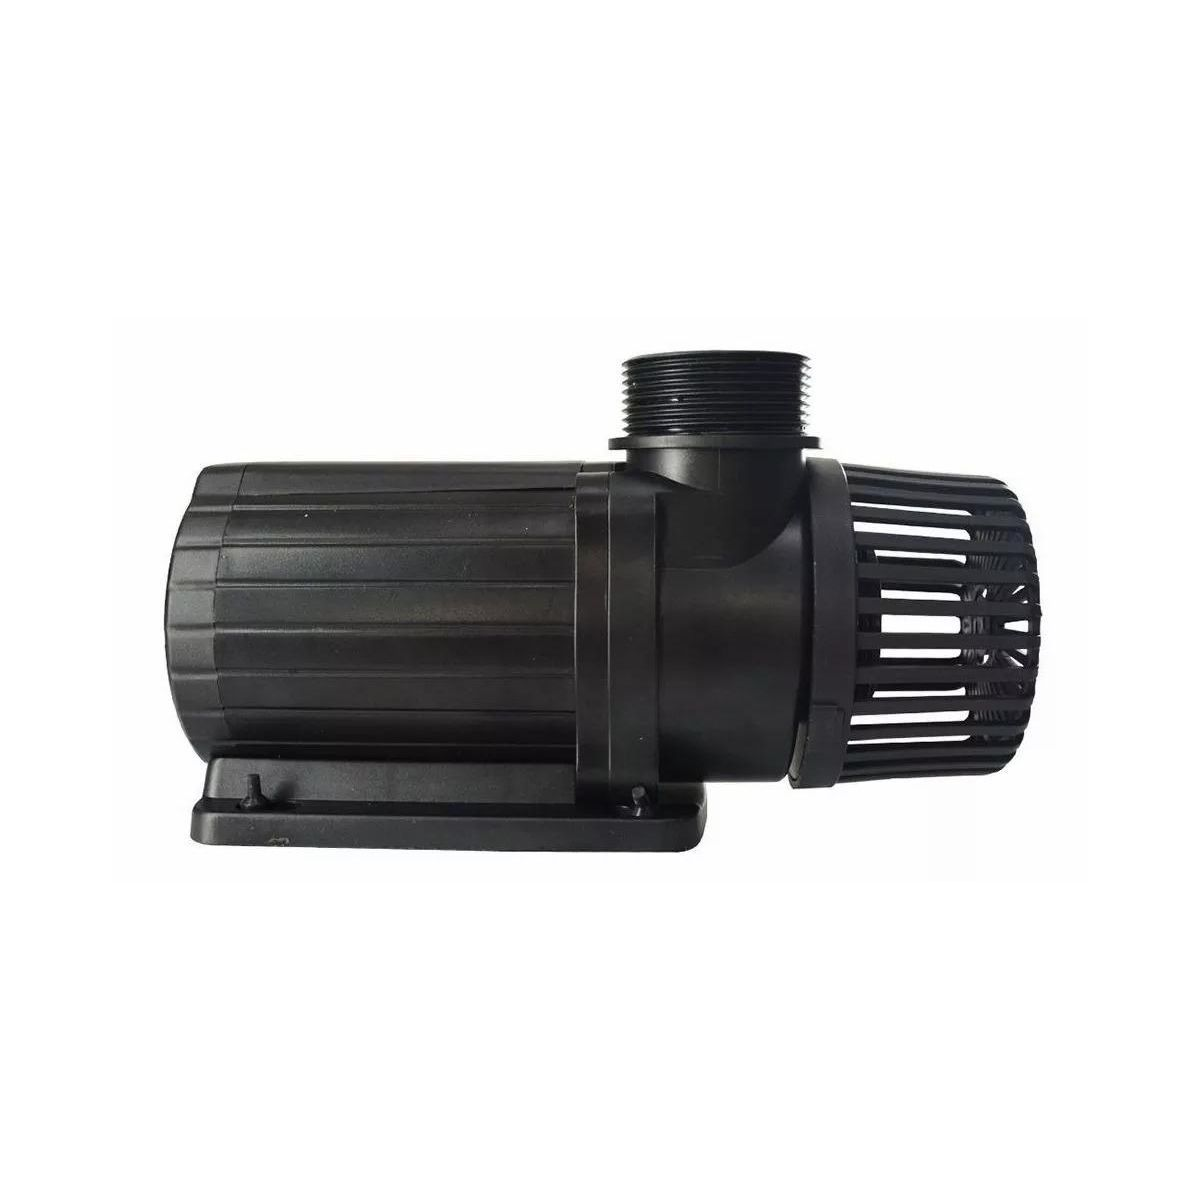 Bomba Ocean Tech 12000l/h Dc-12000 Bivolt Eletronica